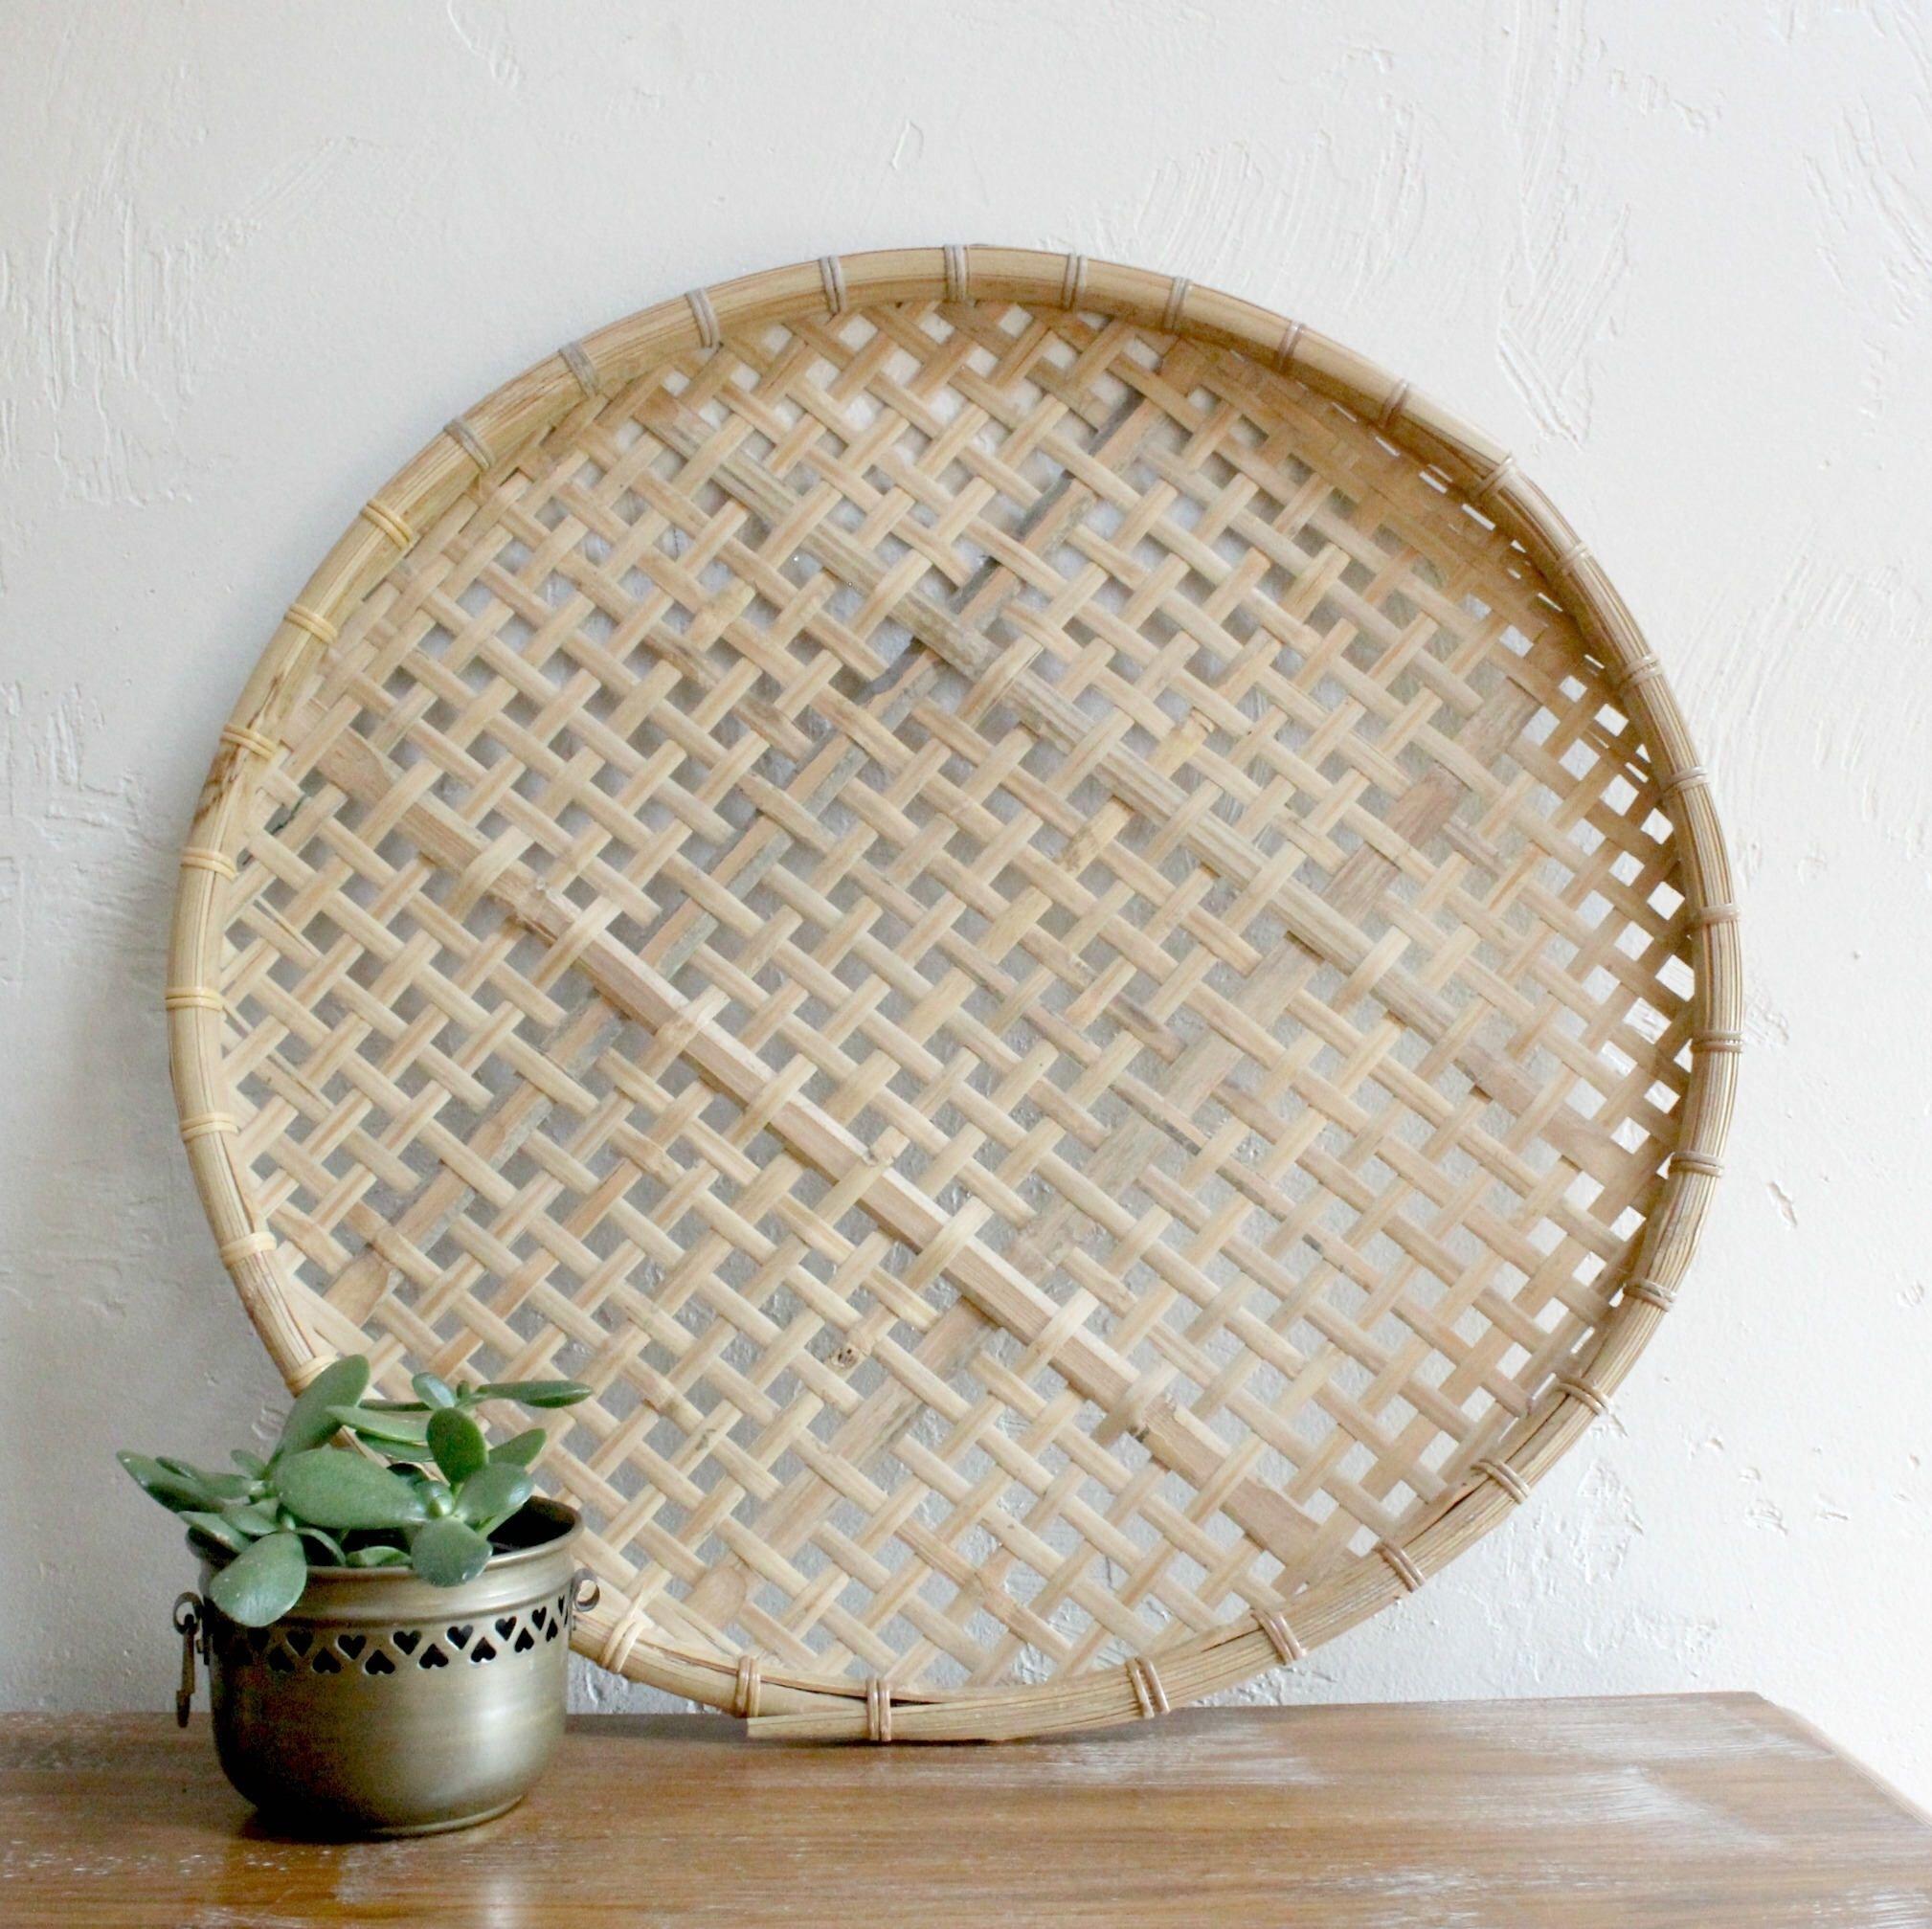 Large Flat Woven Wall Basket Bamboo Basket Large Basket Tray Wall With 2018 Woven Basket Wall Art (Gallery 5 of 20)